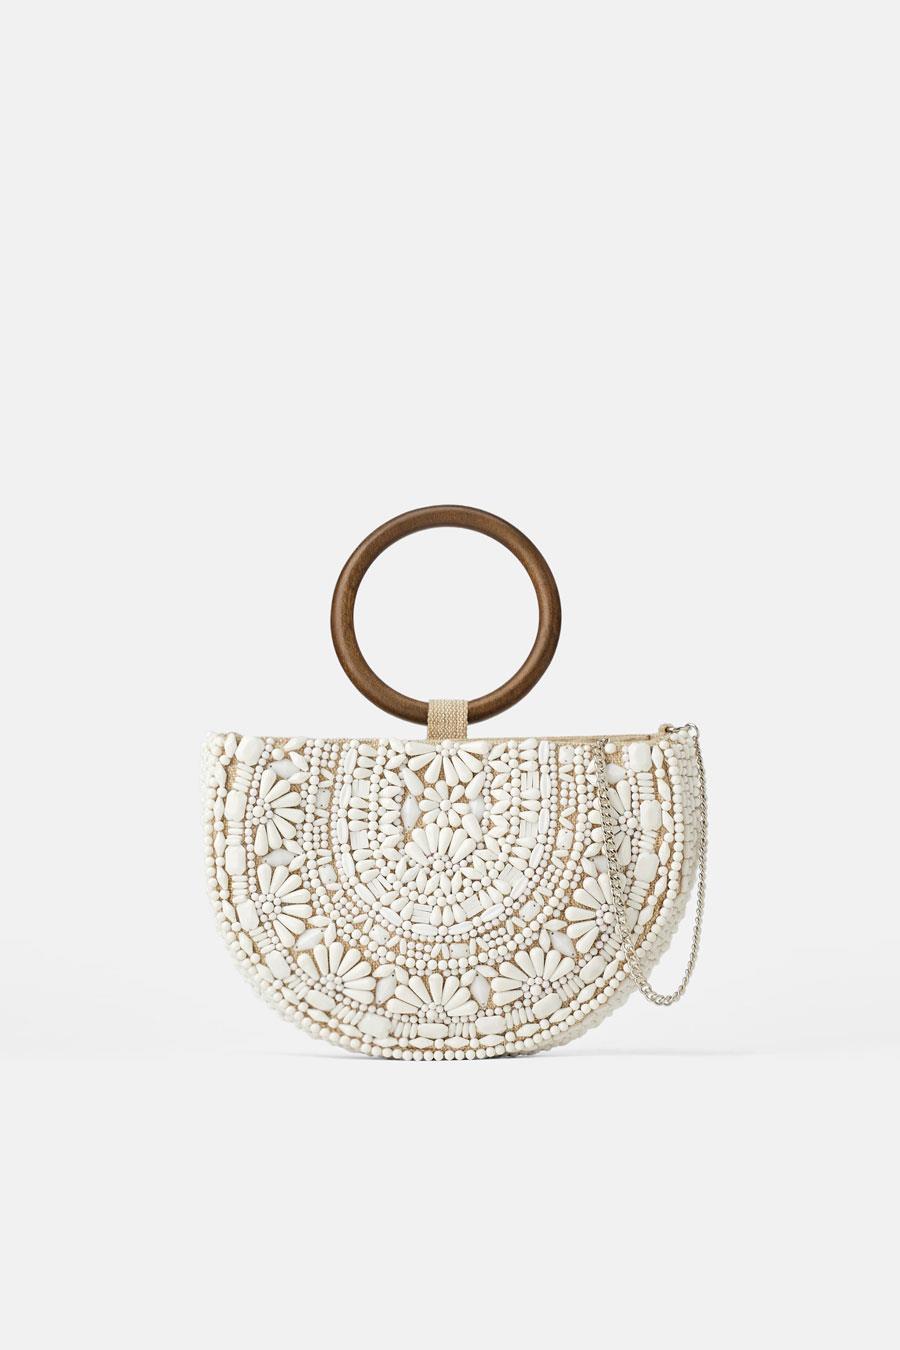 143061d59 Bolsos baratos de moda primavera verano en Zara, Bershka, Mango ...